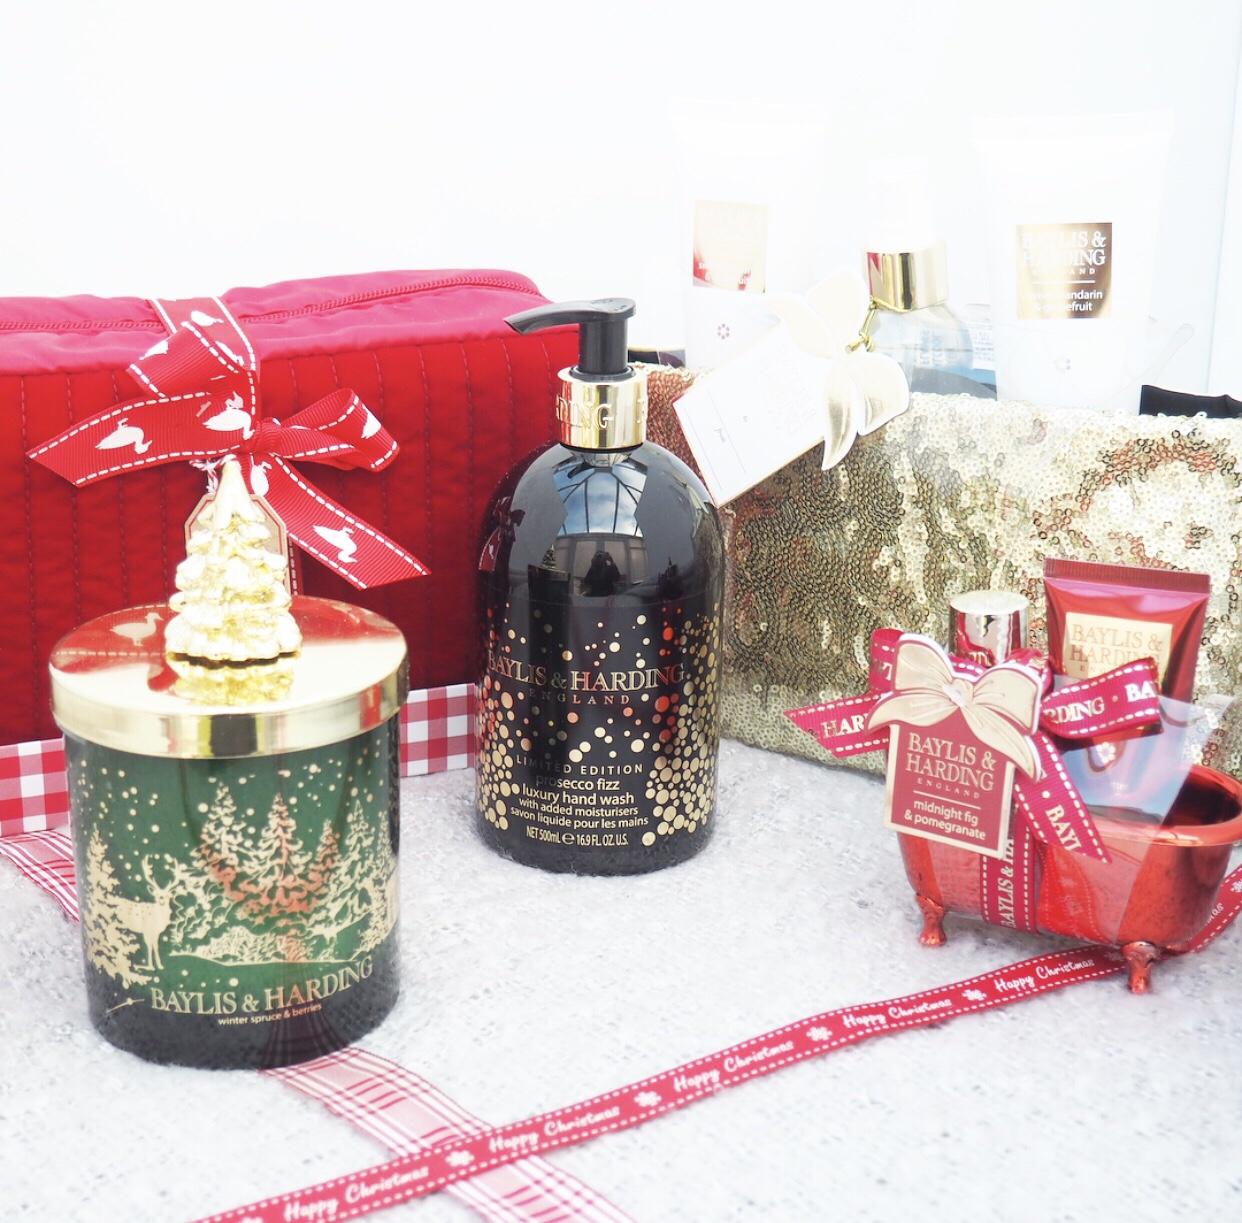 *Baylis & Harding Christmas Gift Guide